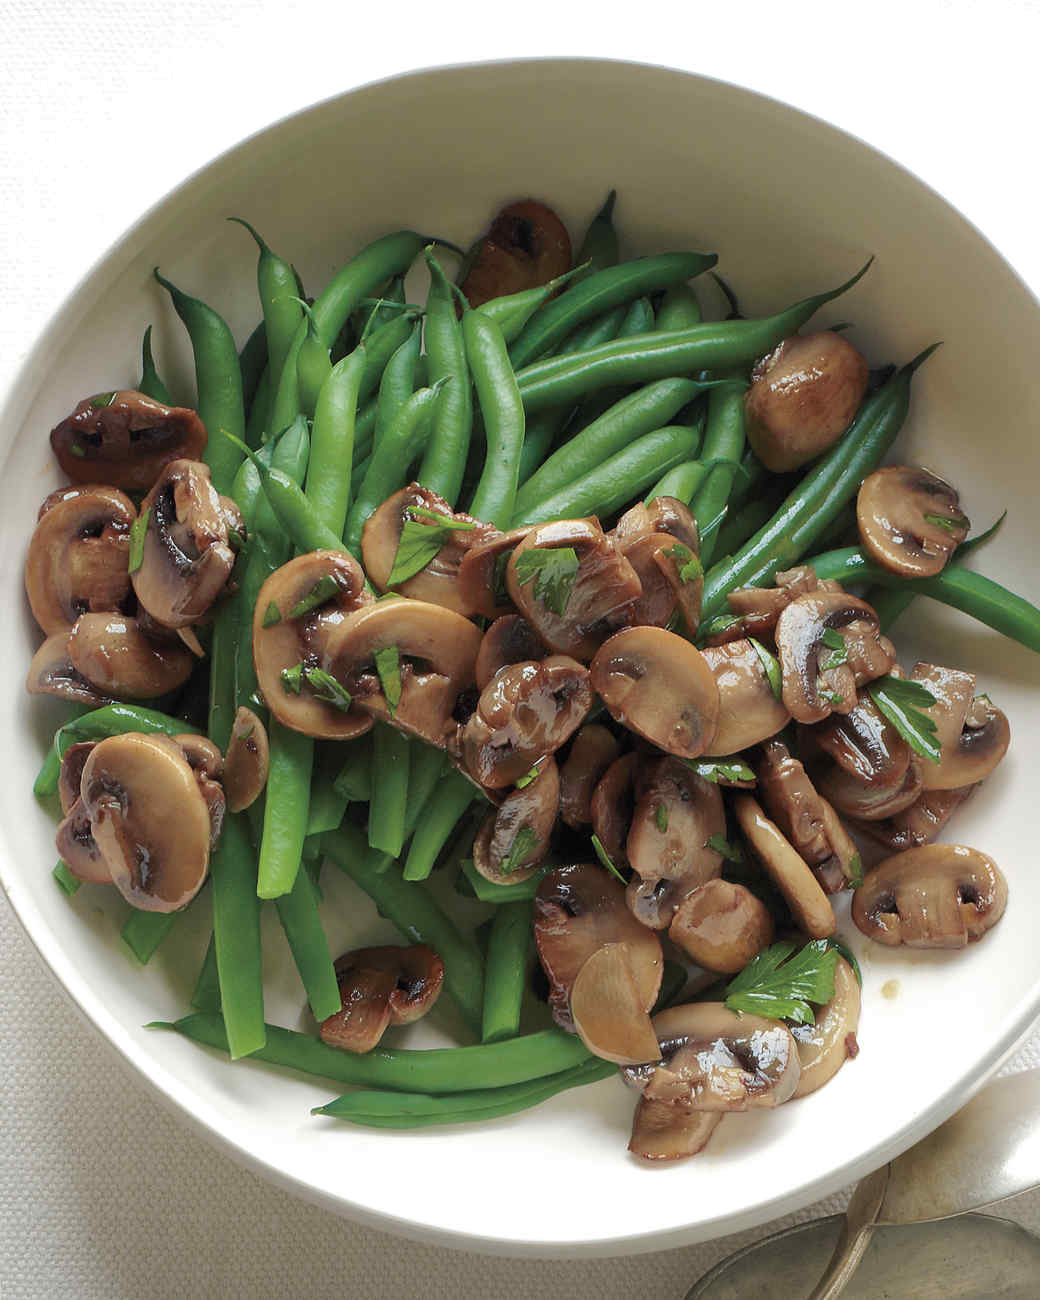 Green Beans with Sauteed Mushrooms and Garlic